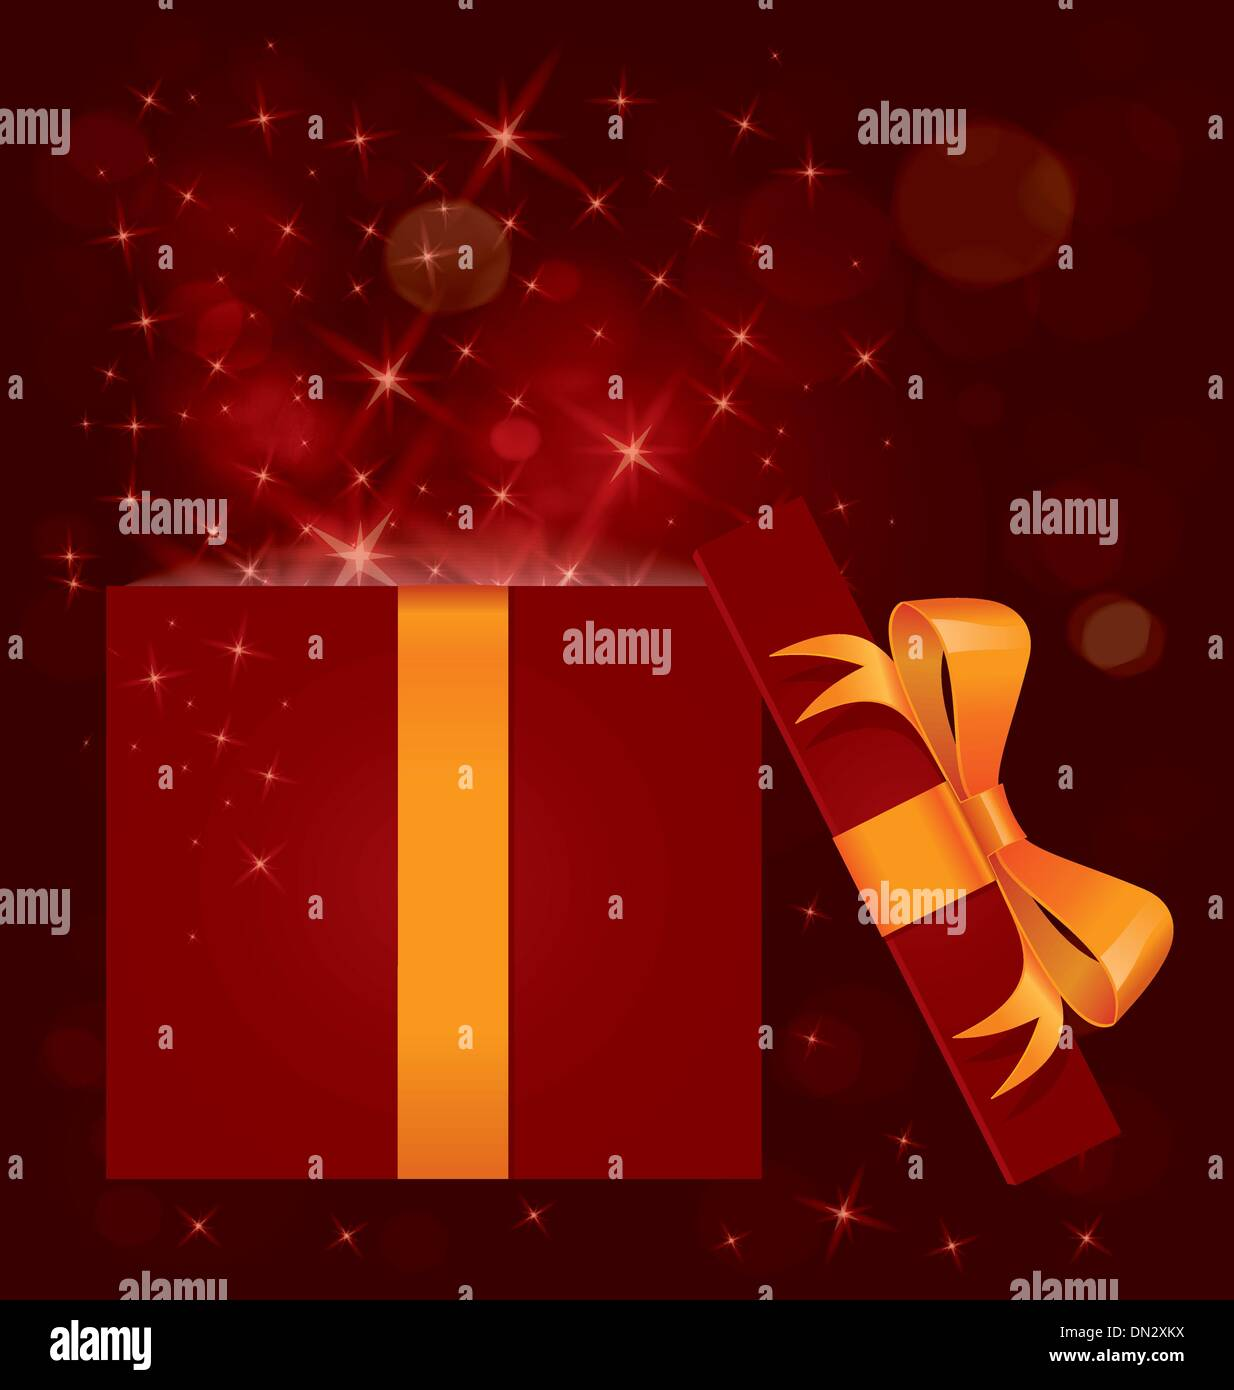 Magic light gift box open vector - Stock Image